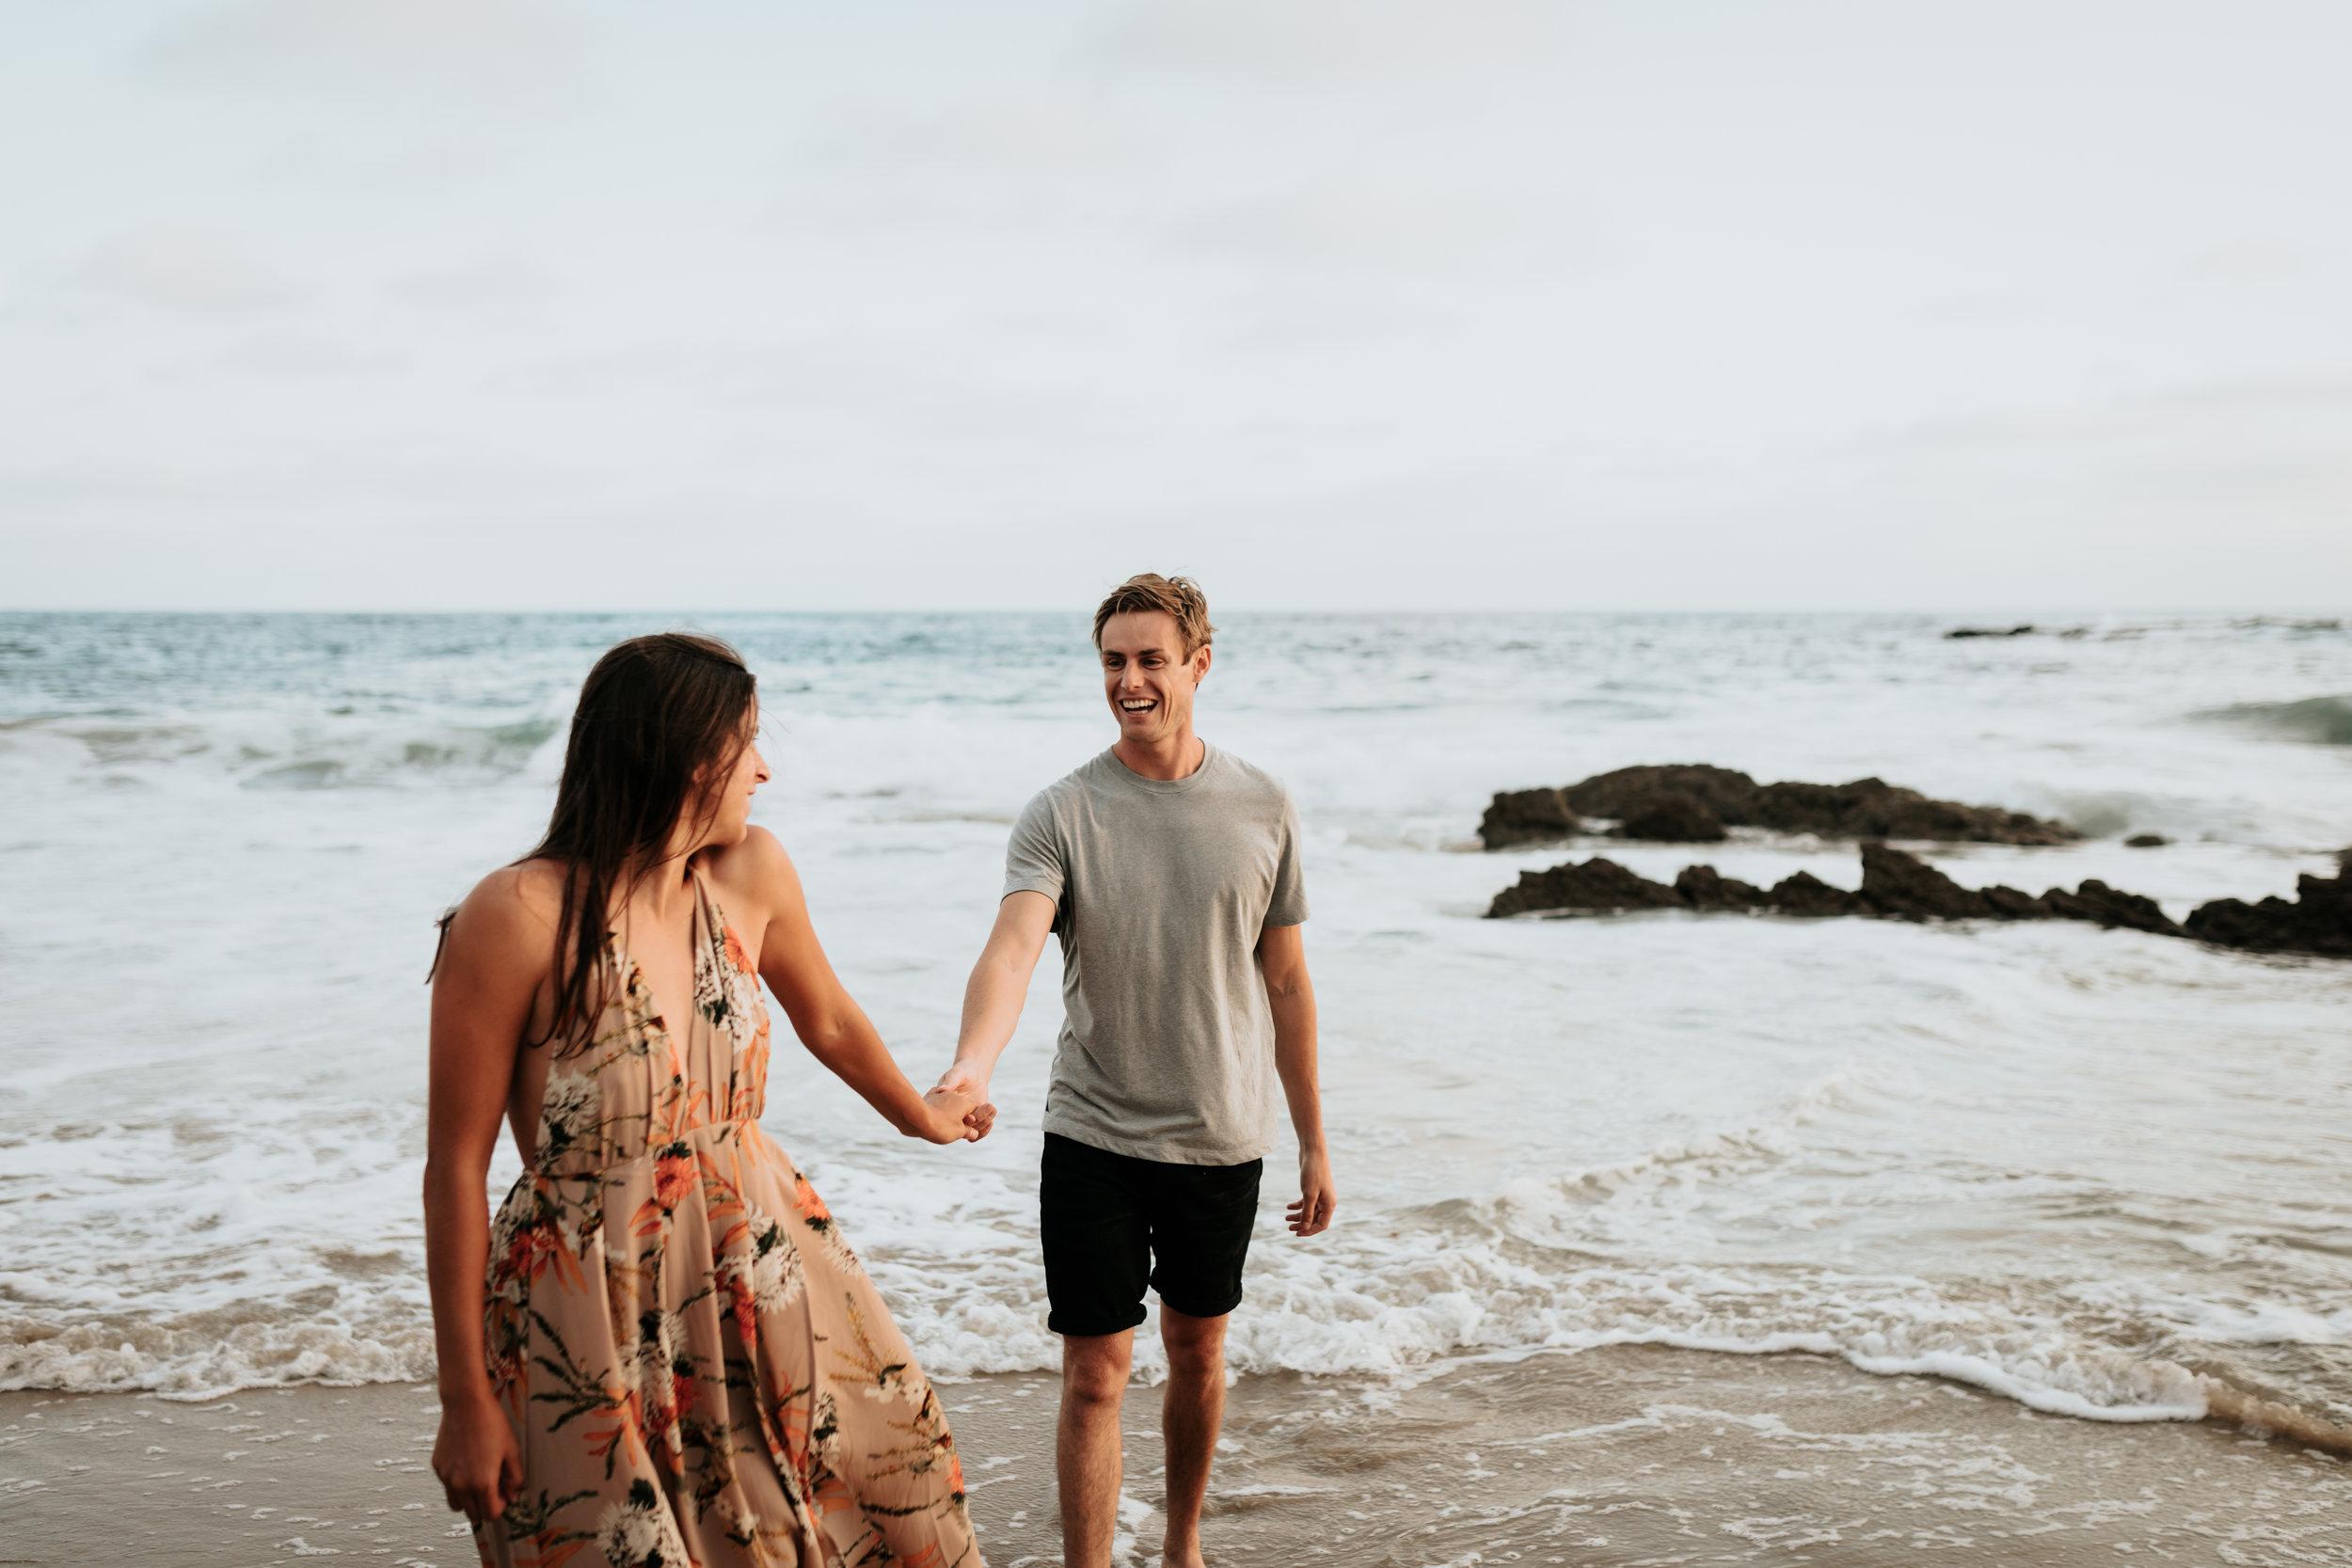 san-diego-beach-engagement-session (21).jpg